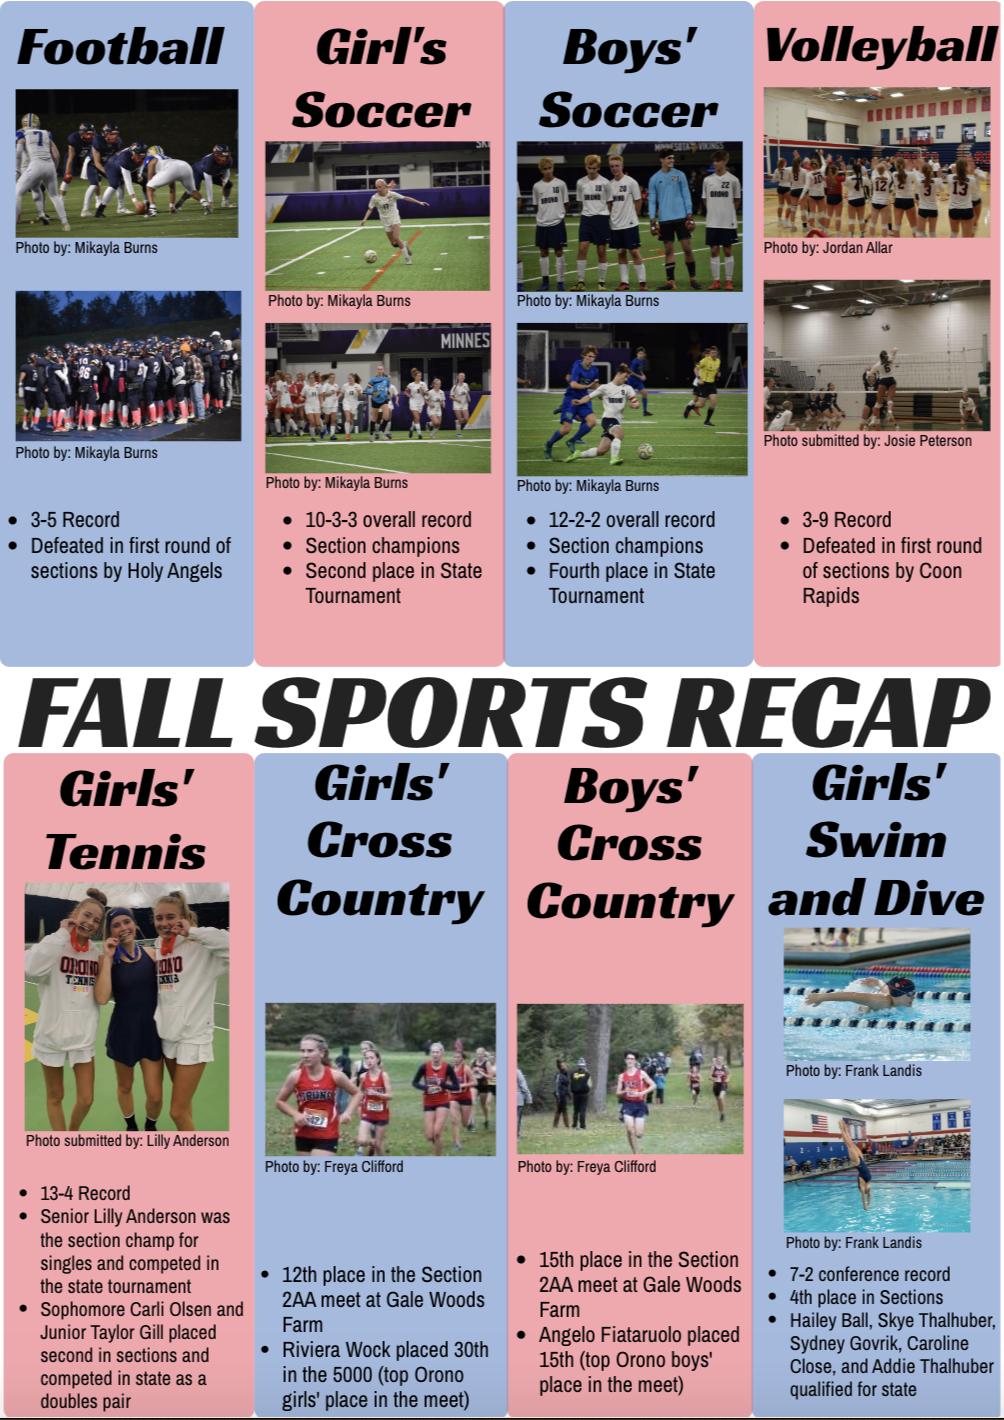 Fall Sports at Orono had a variety of successes throughout the season.